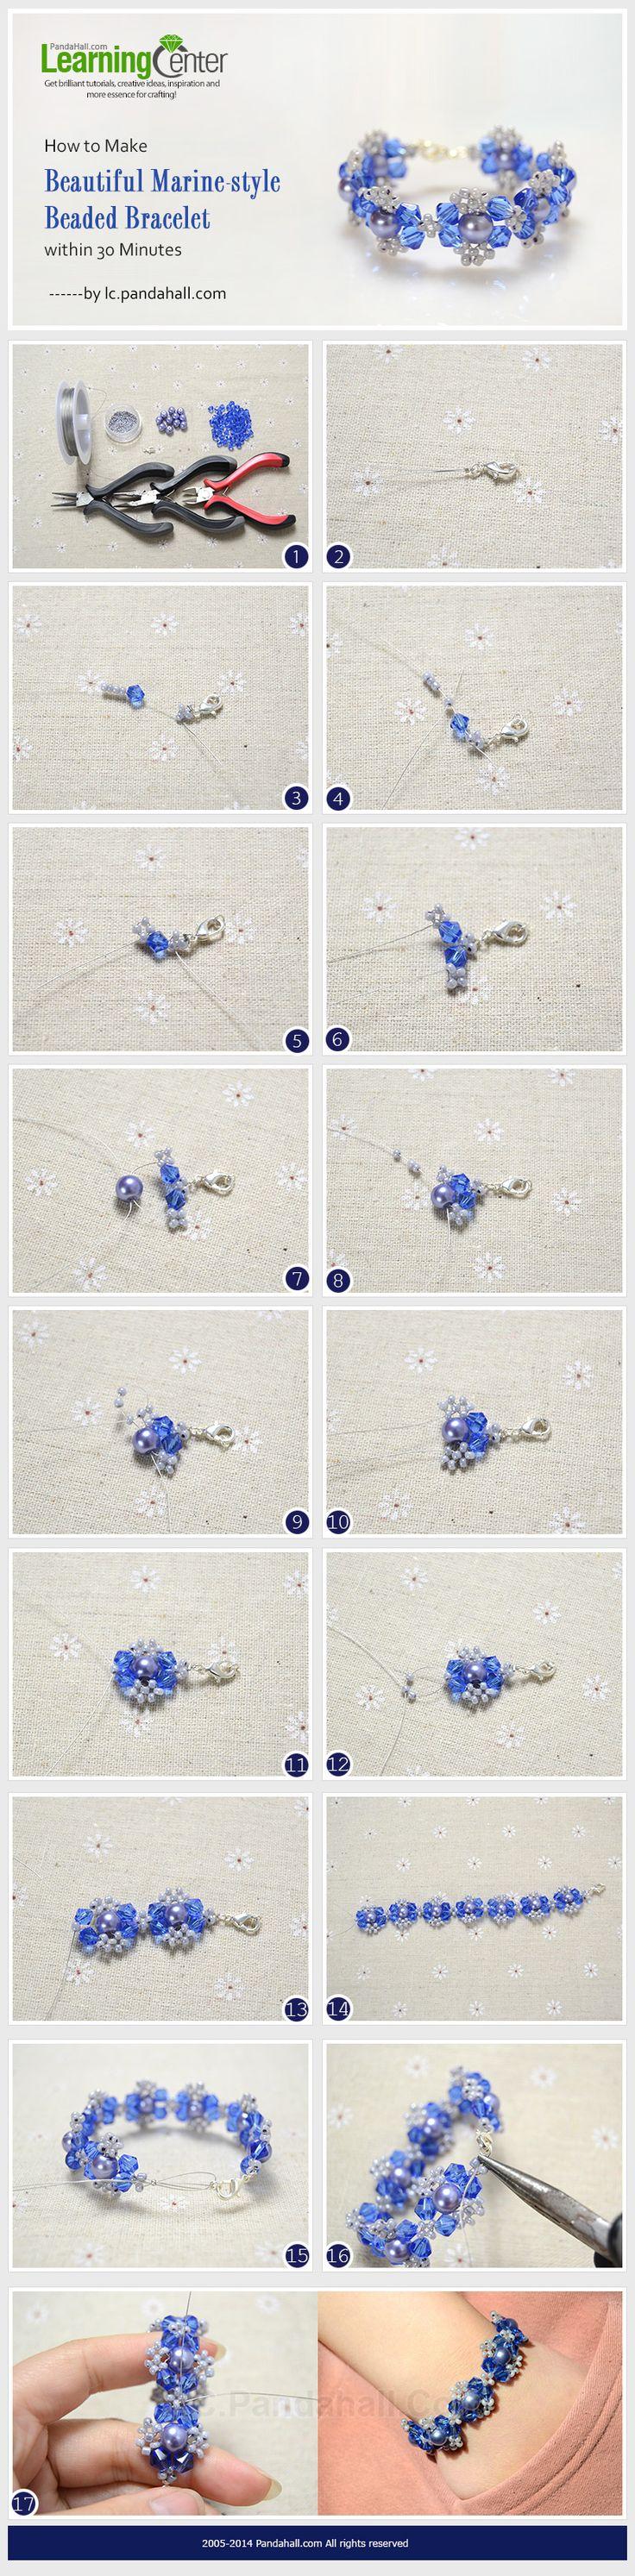 How to Make Beautiful Marine-style Beaded Bracelet within 30 Minutes